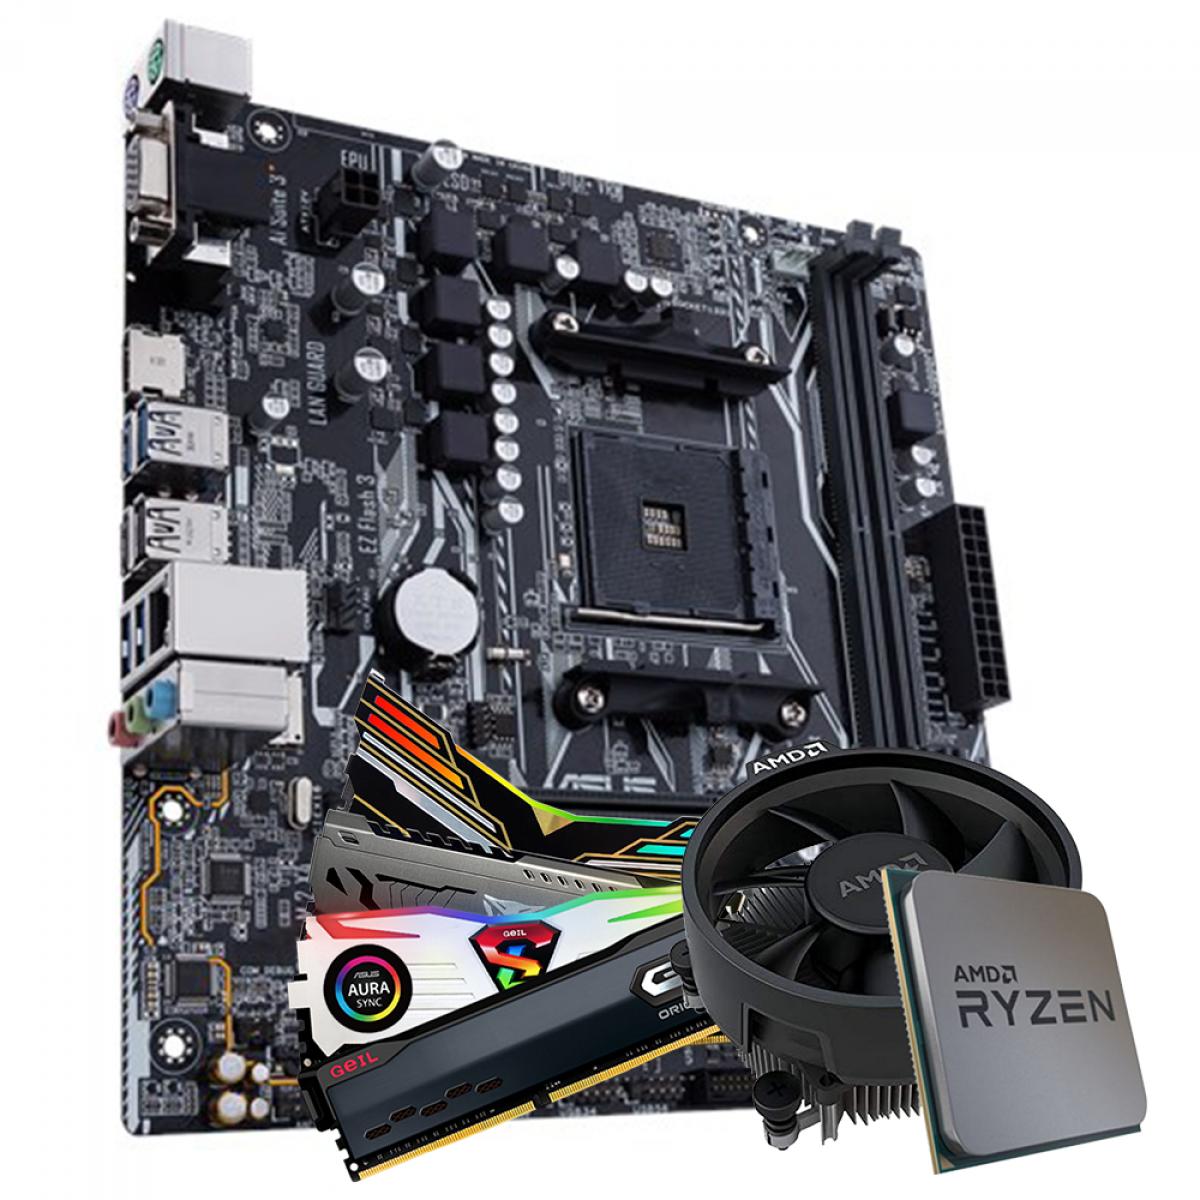 Kit Upgrade, AMD Ryzen 5 PRO 4650G, Asus Prime A320M-K, Memória DDR4 16GB (2x8GB) 3000MHz